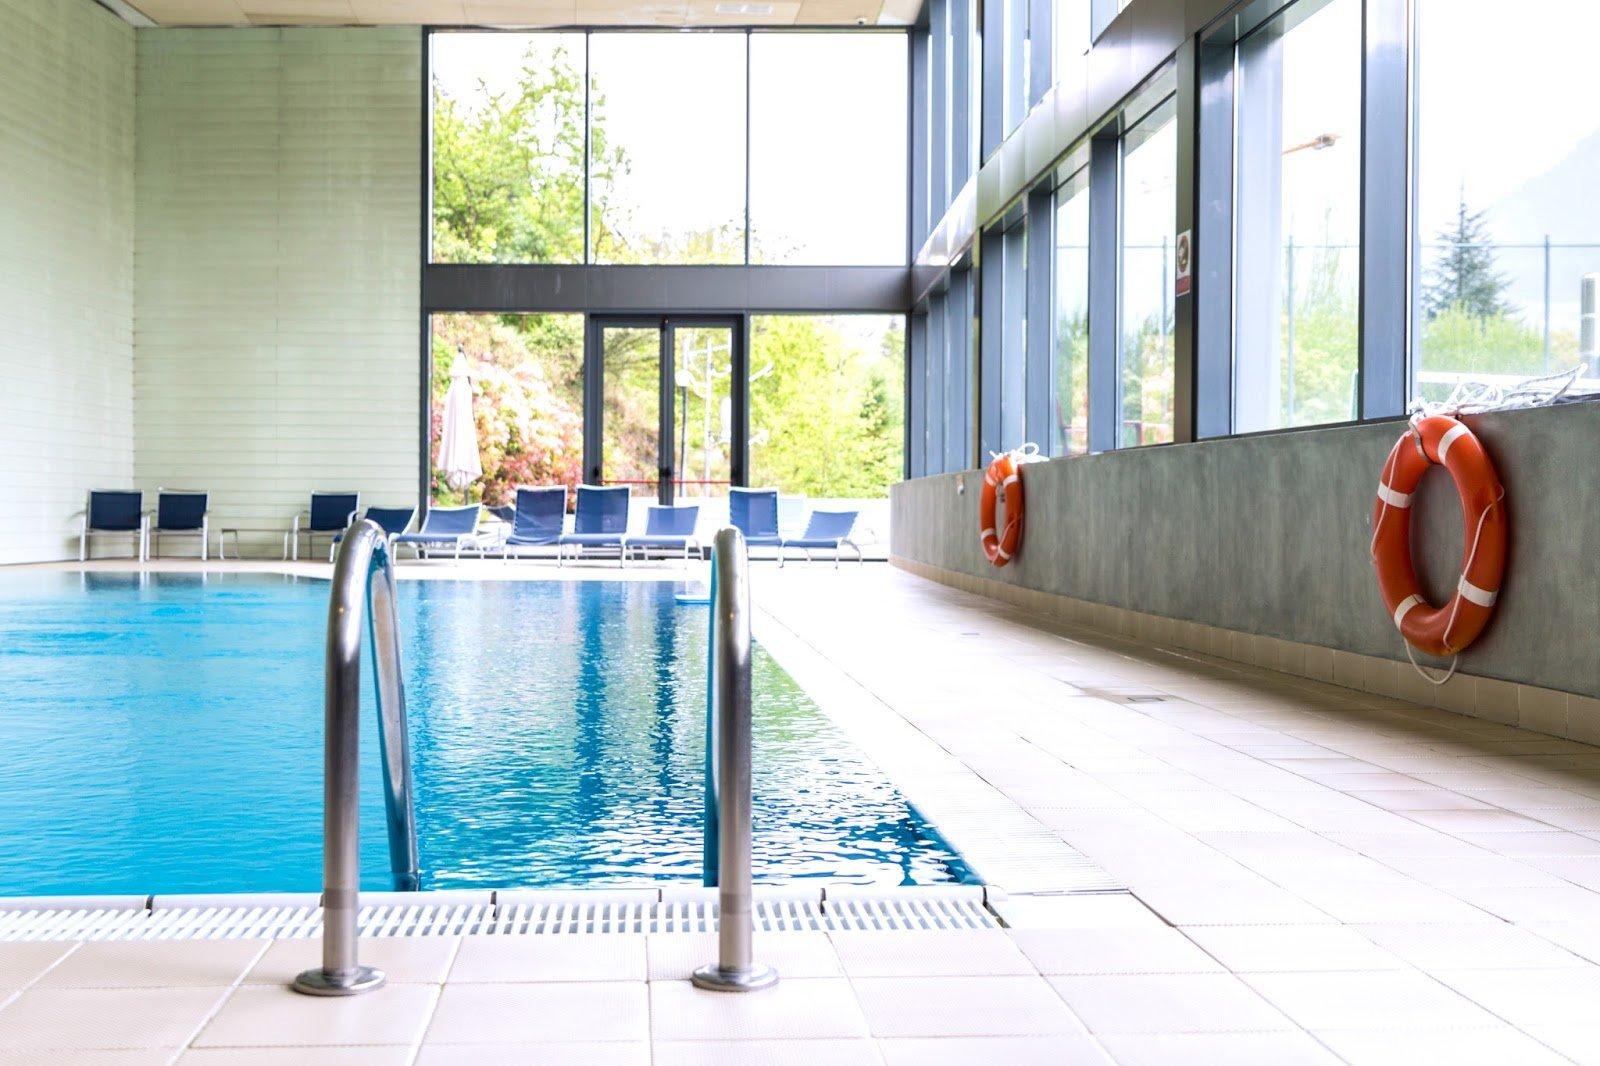 Andorra Park spa piscine